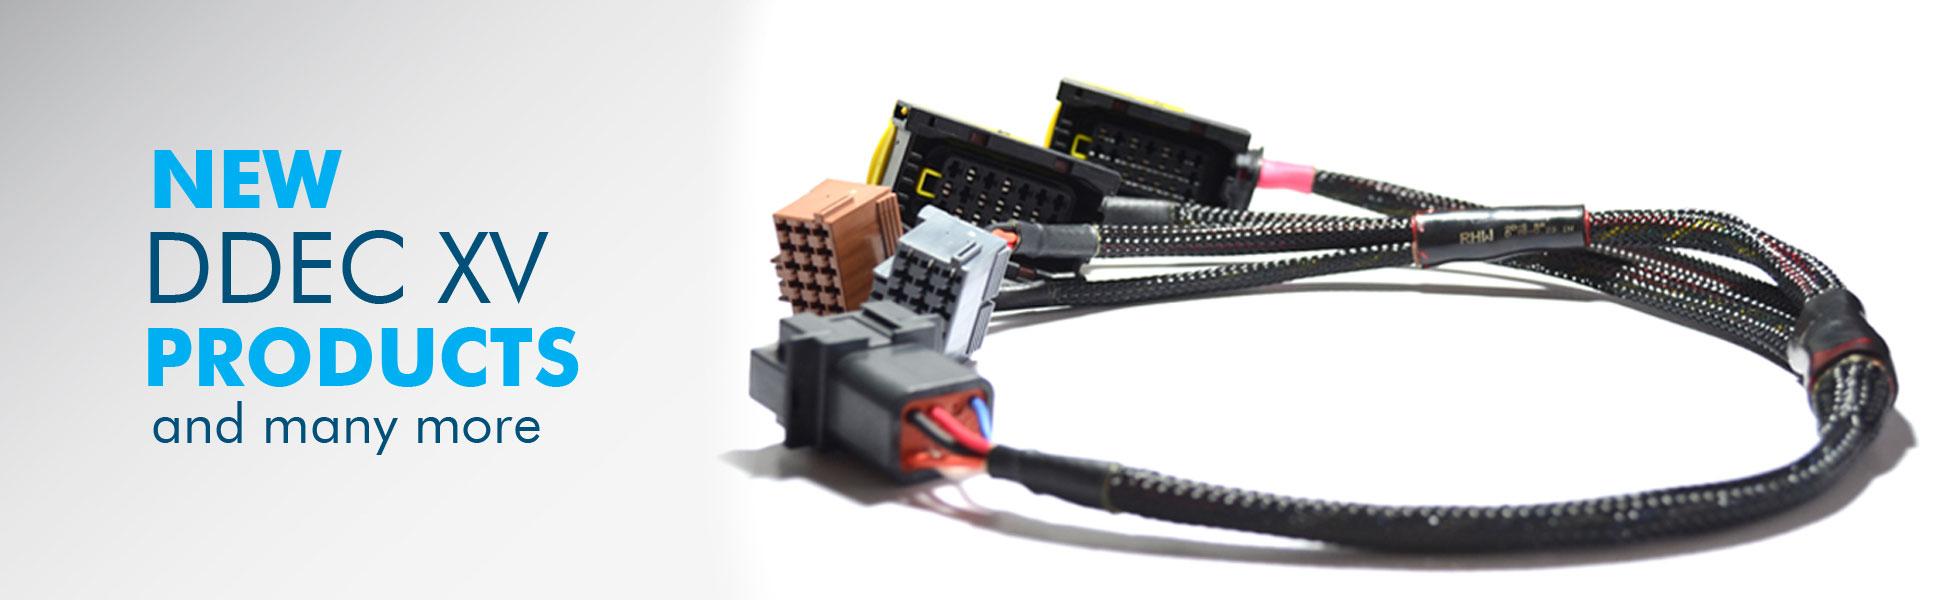 New DDEC XV Products